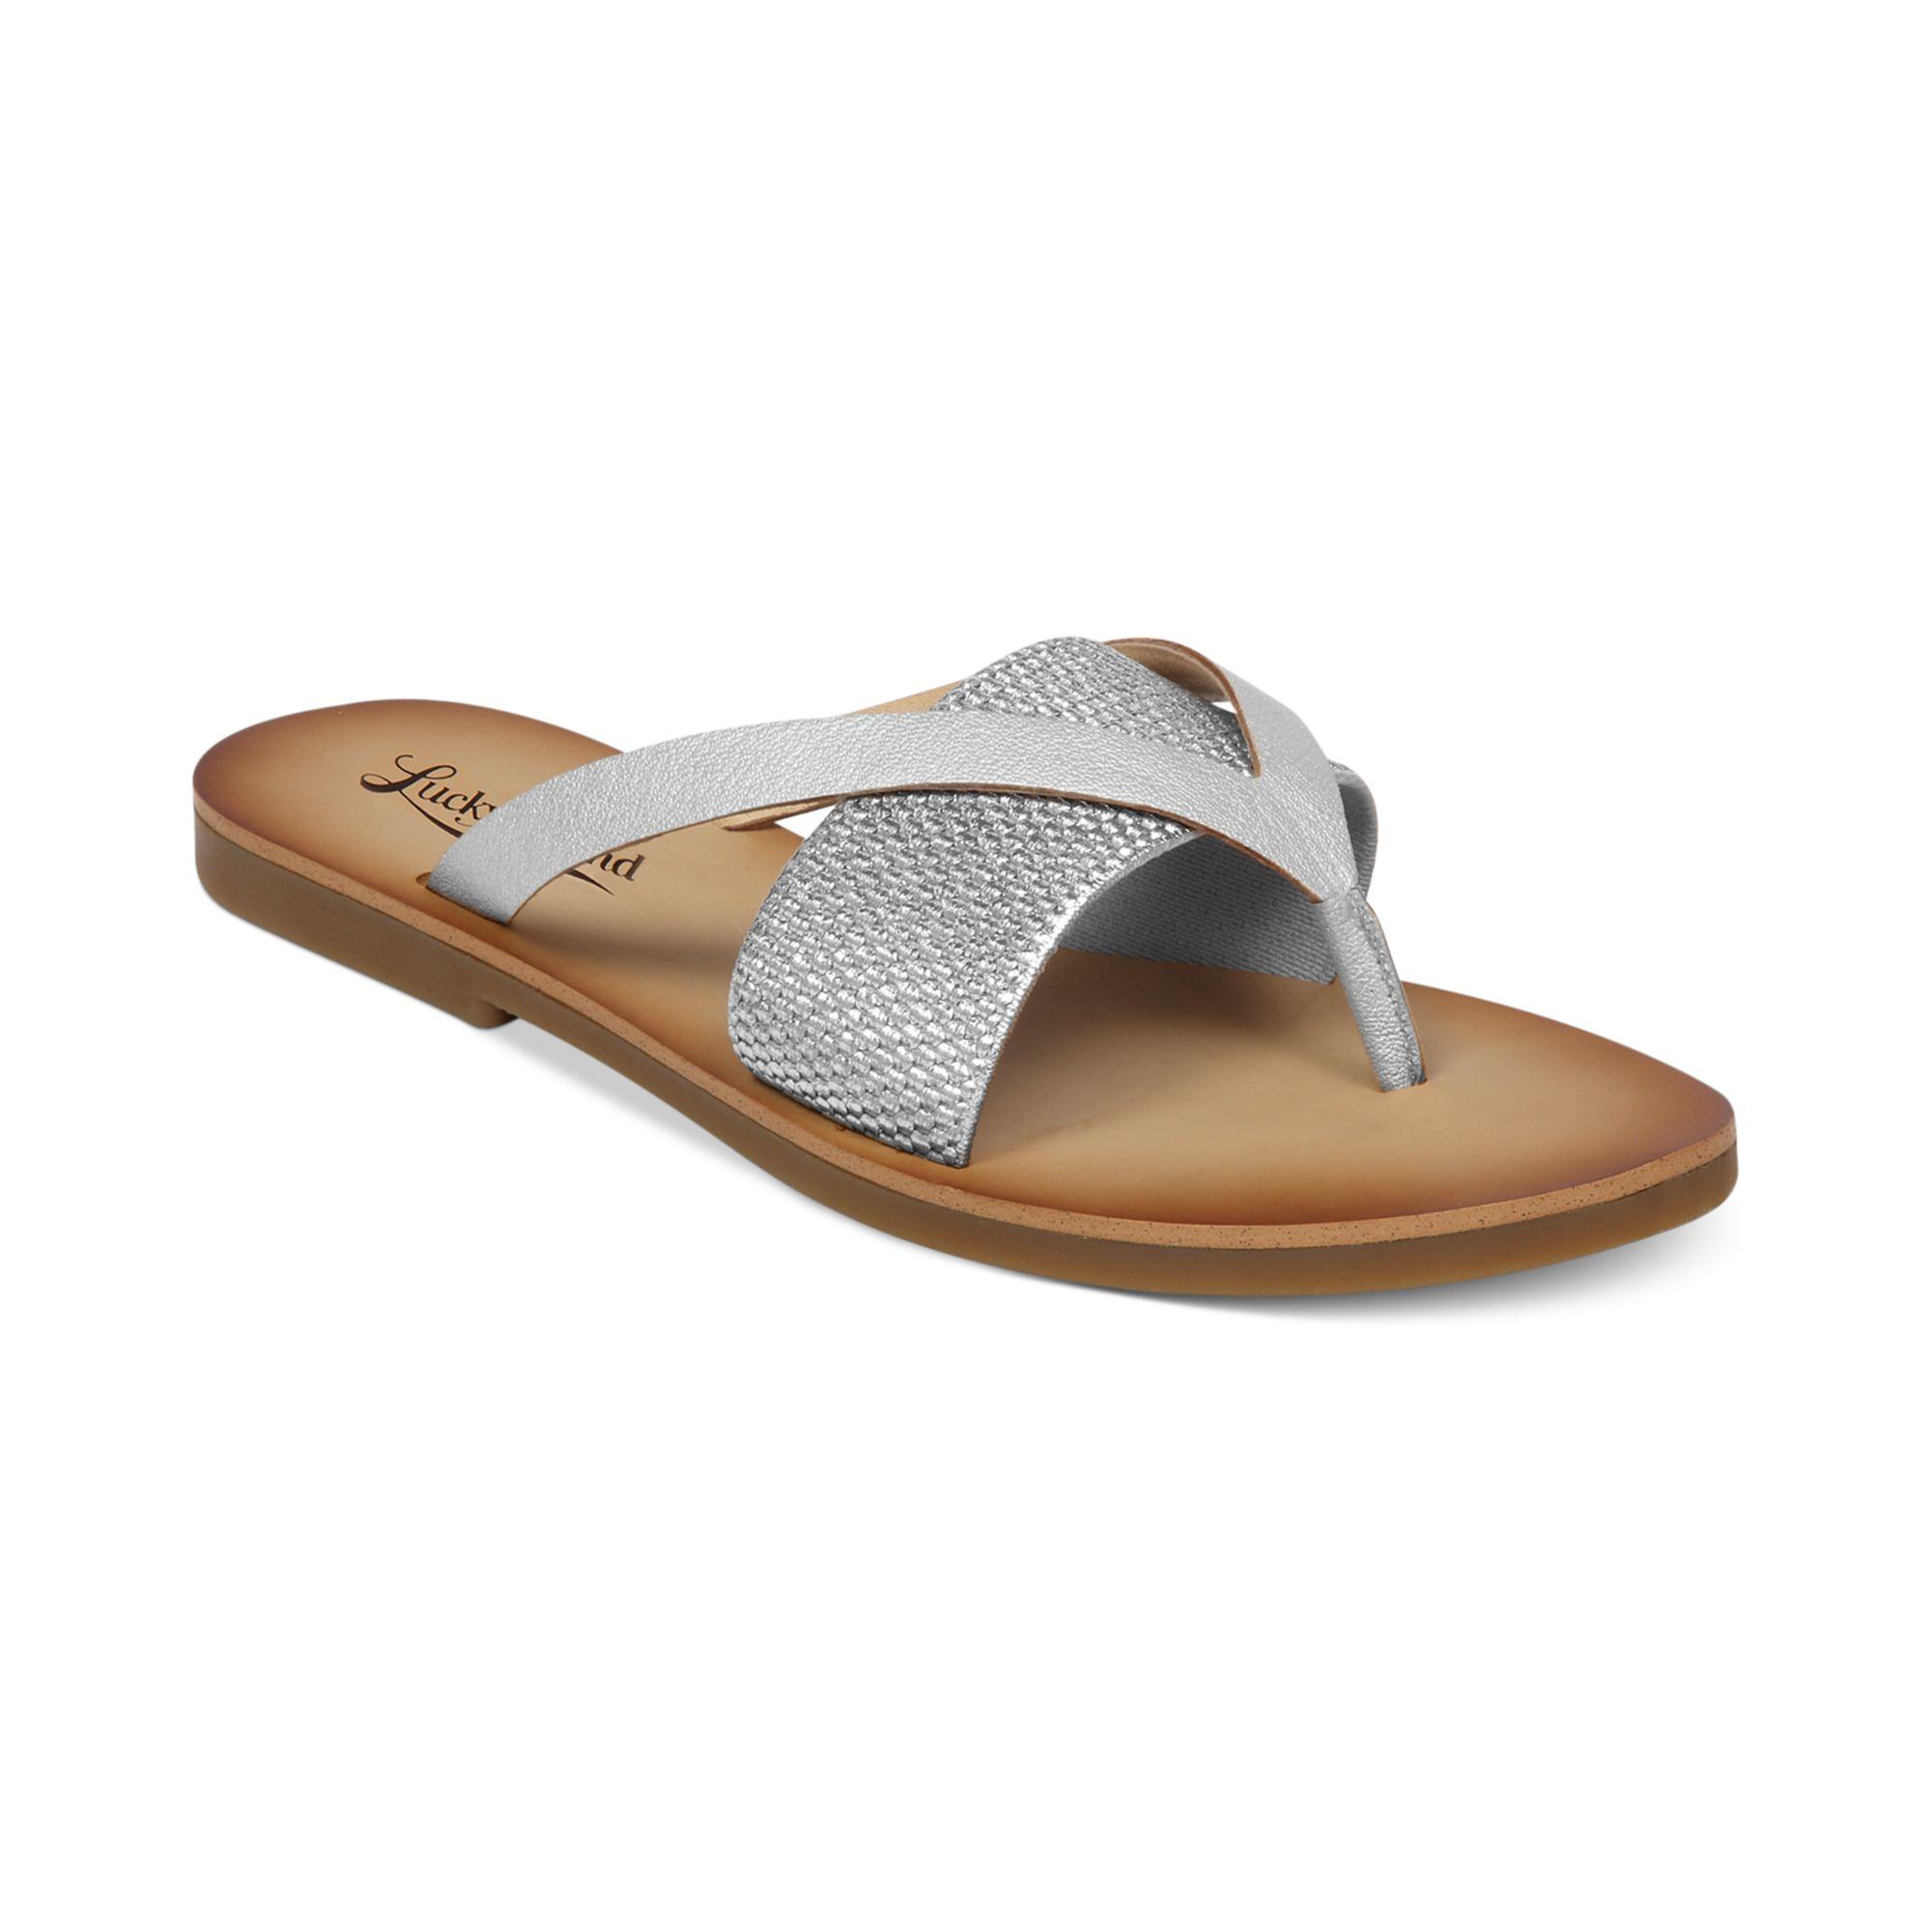 Lucky Brand Womens Baxx Flat Thong Sandals In Silver   Lyst